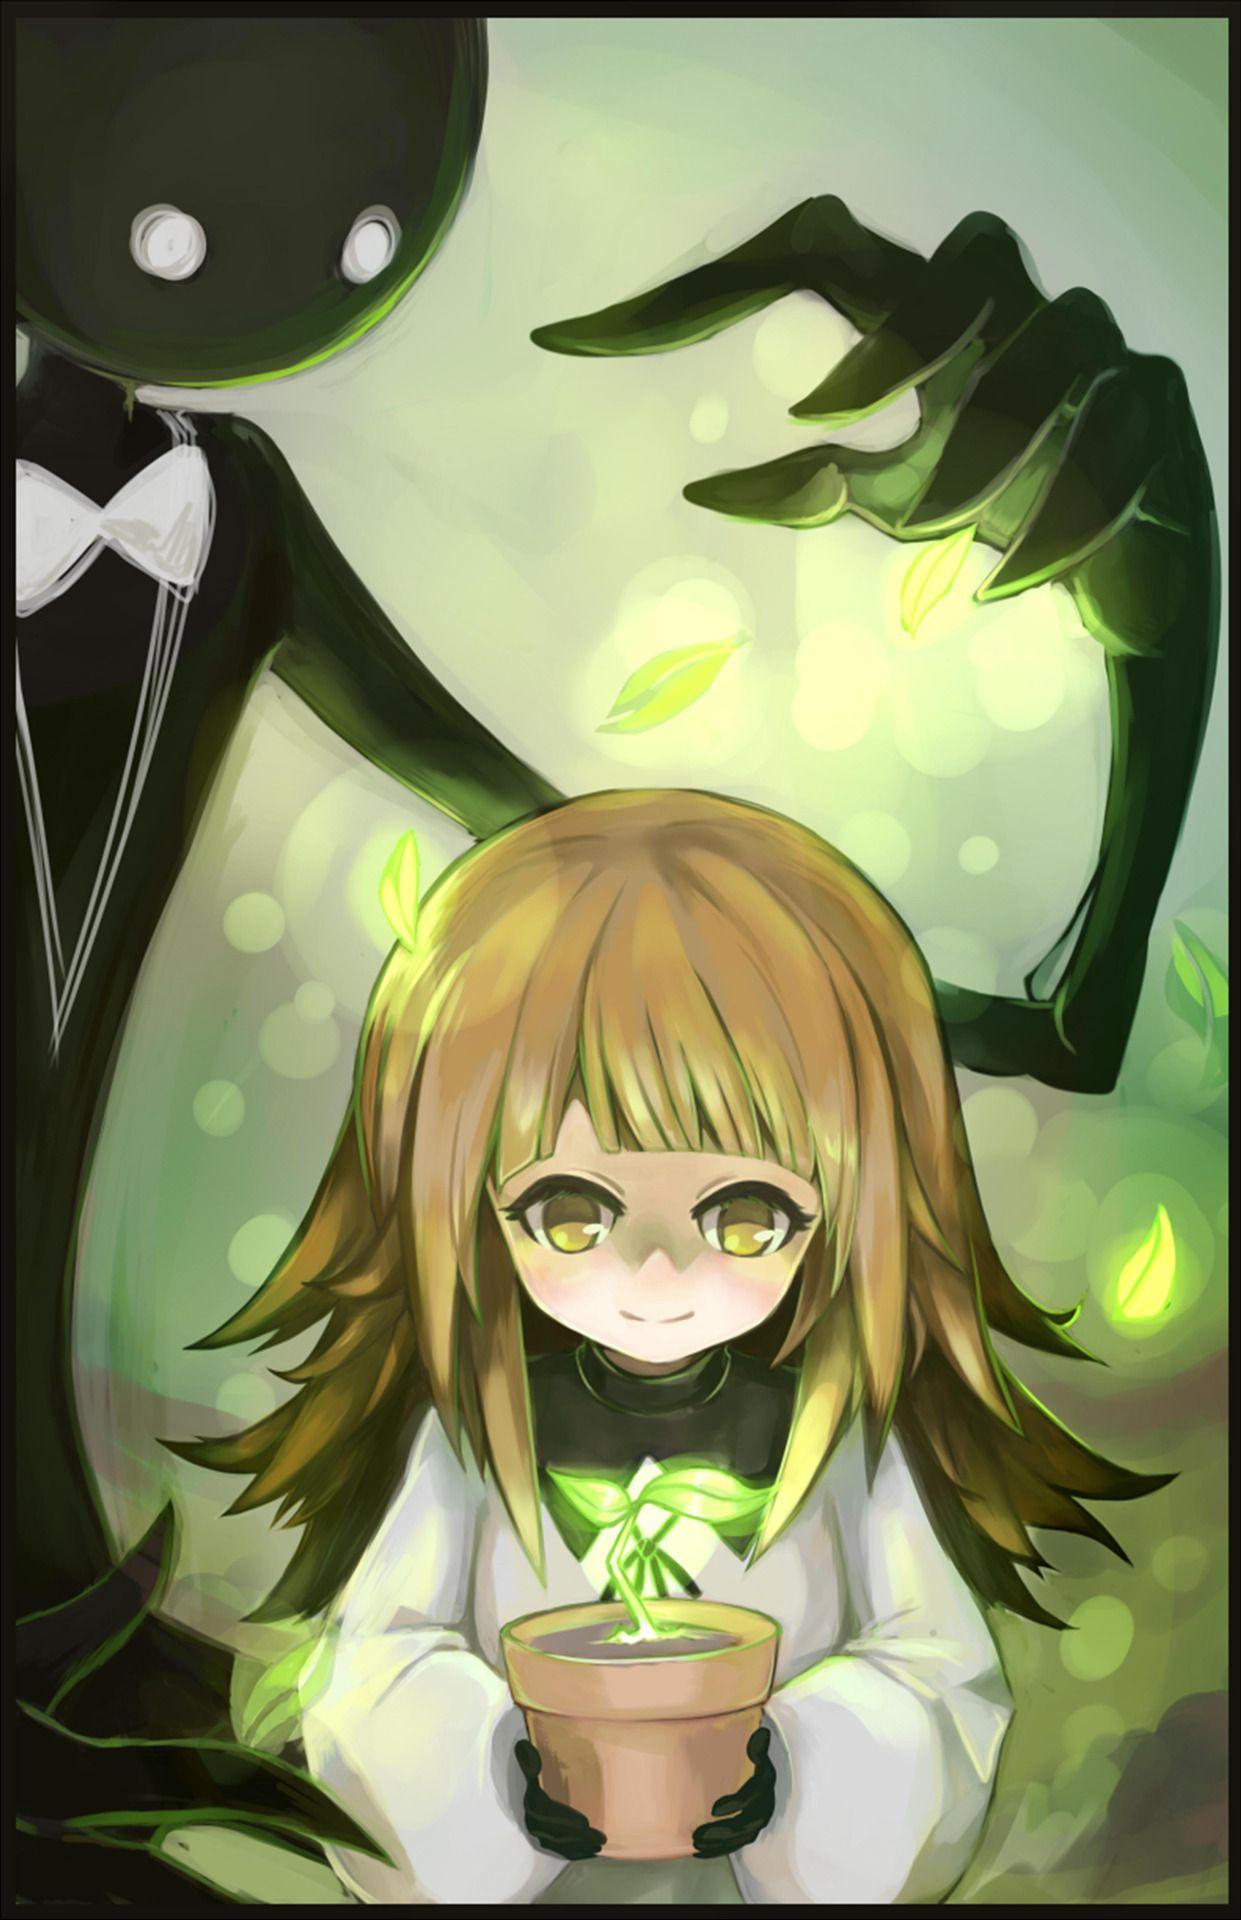 game deemo Tumblr Arte de anime, Dibujos, Dibujos de